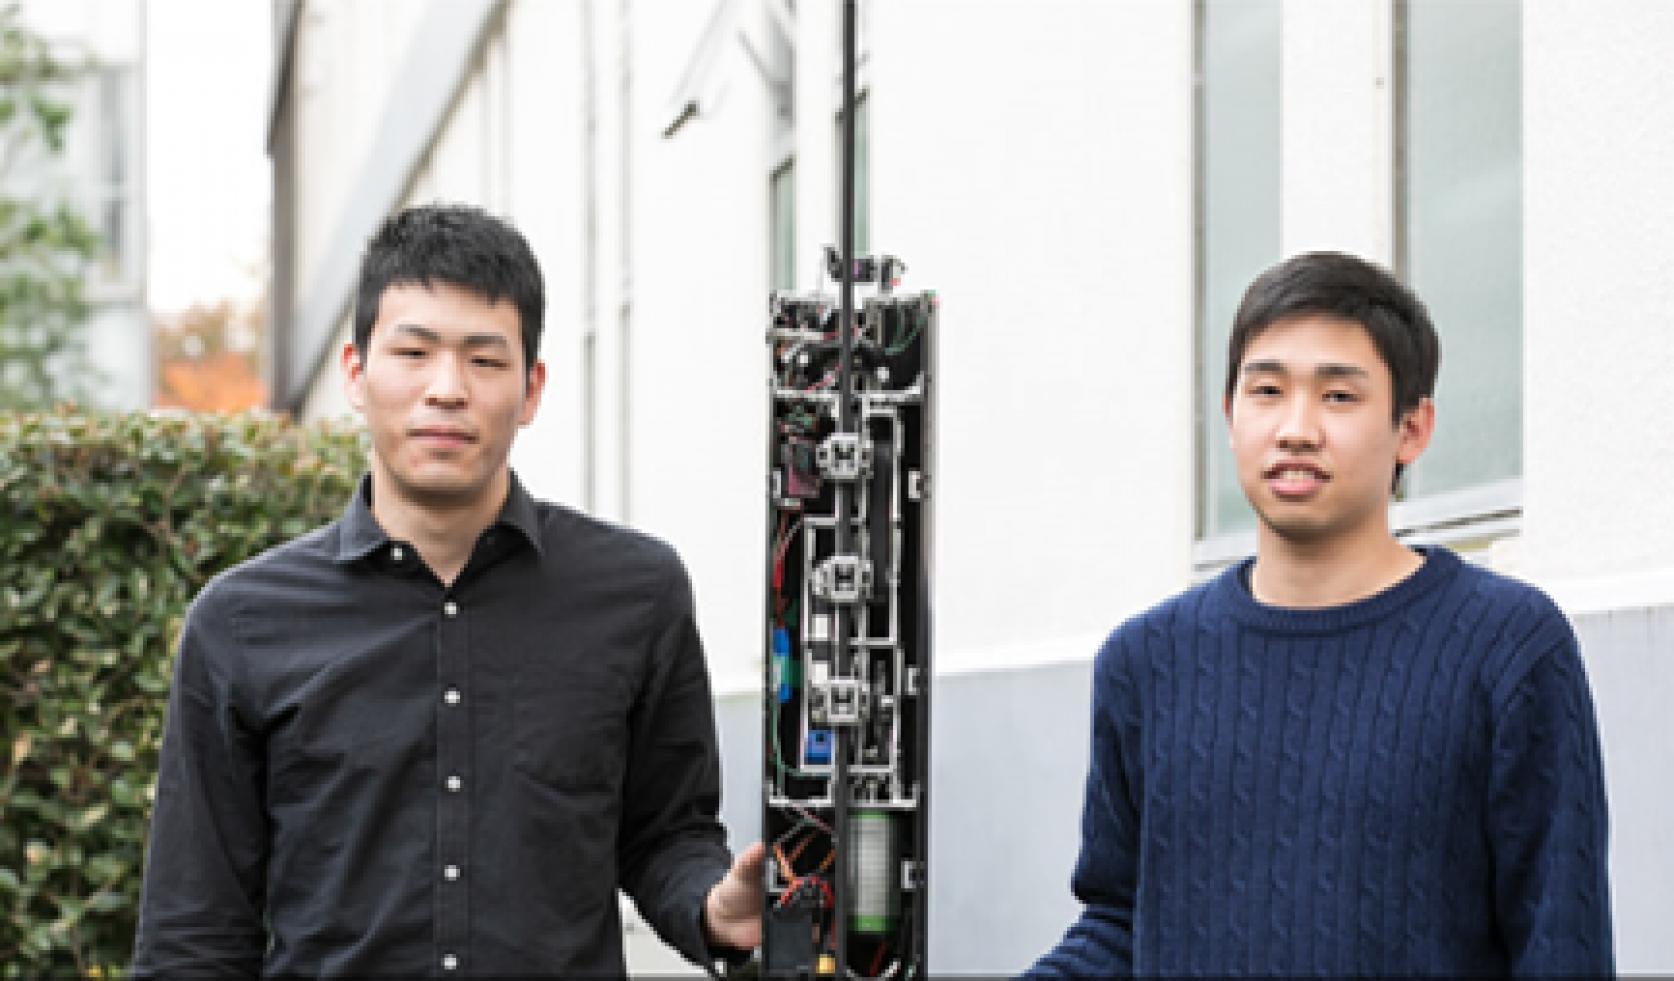 Autodesk社Redshiftに、精密機械工学科 青木義男教授と青木研究室の小池魁舟さん(4年)荒川直輝さん(4年)の宇宙エレベータープロジェクトの記事が掲載されました。